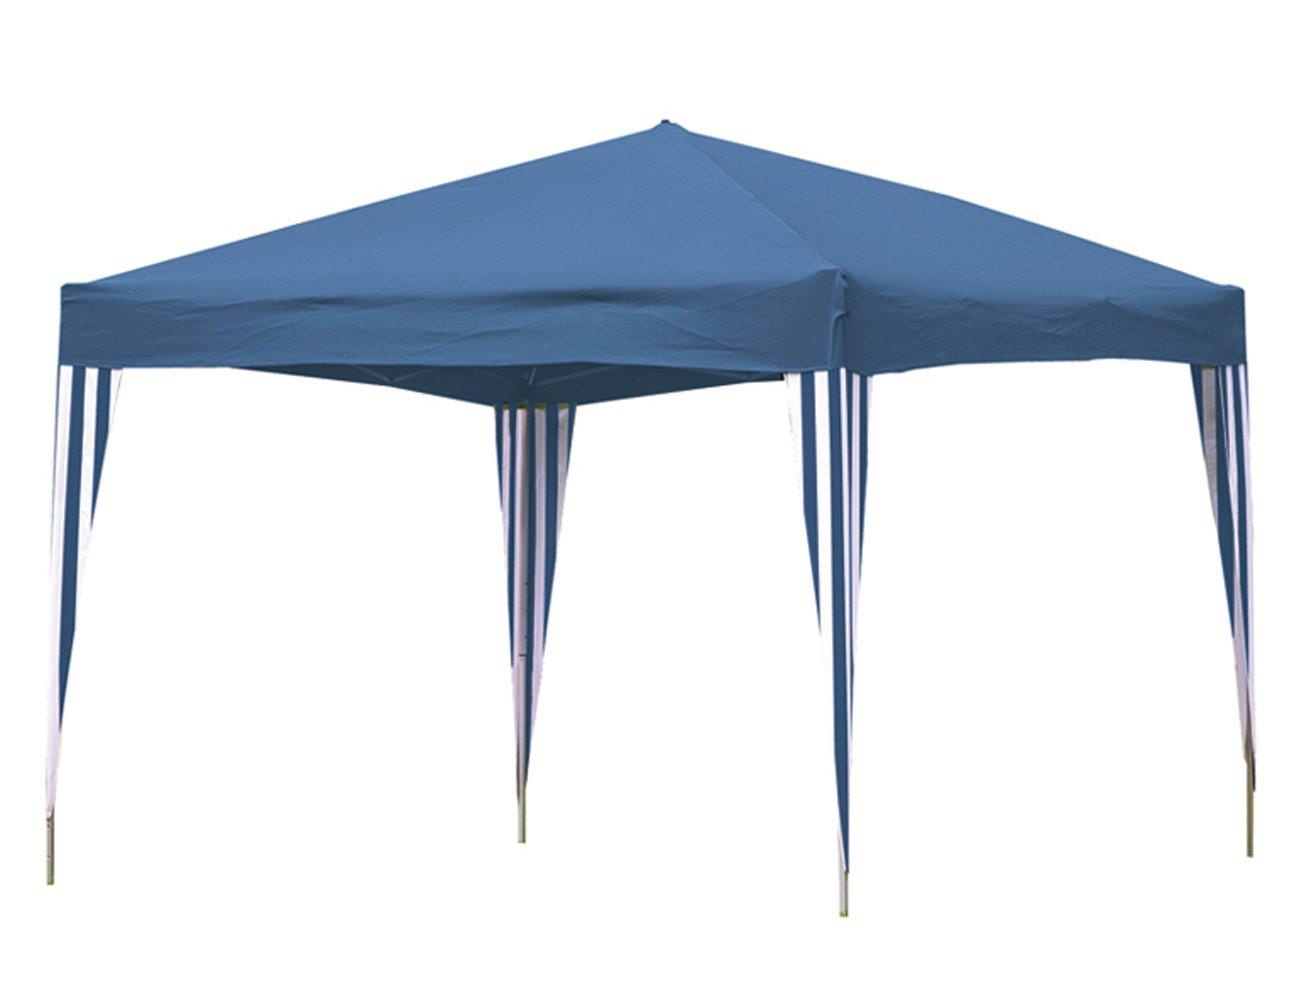 Siena Garden 506170 Alu-Faltpavillon, blau/weiß , L 300 x B 300 cm